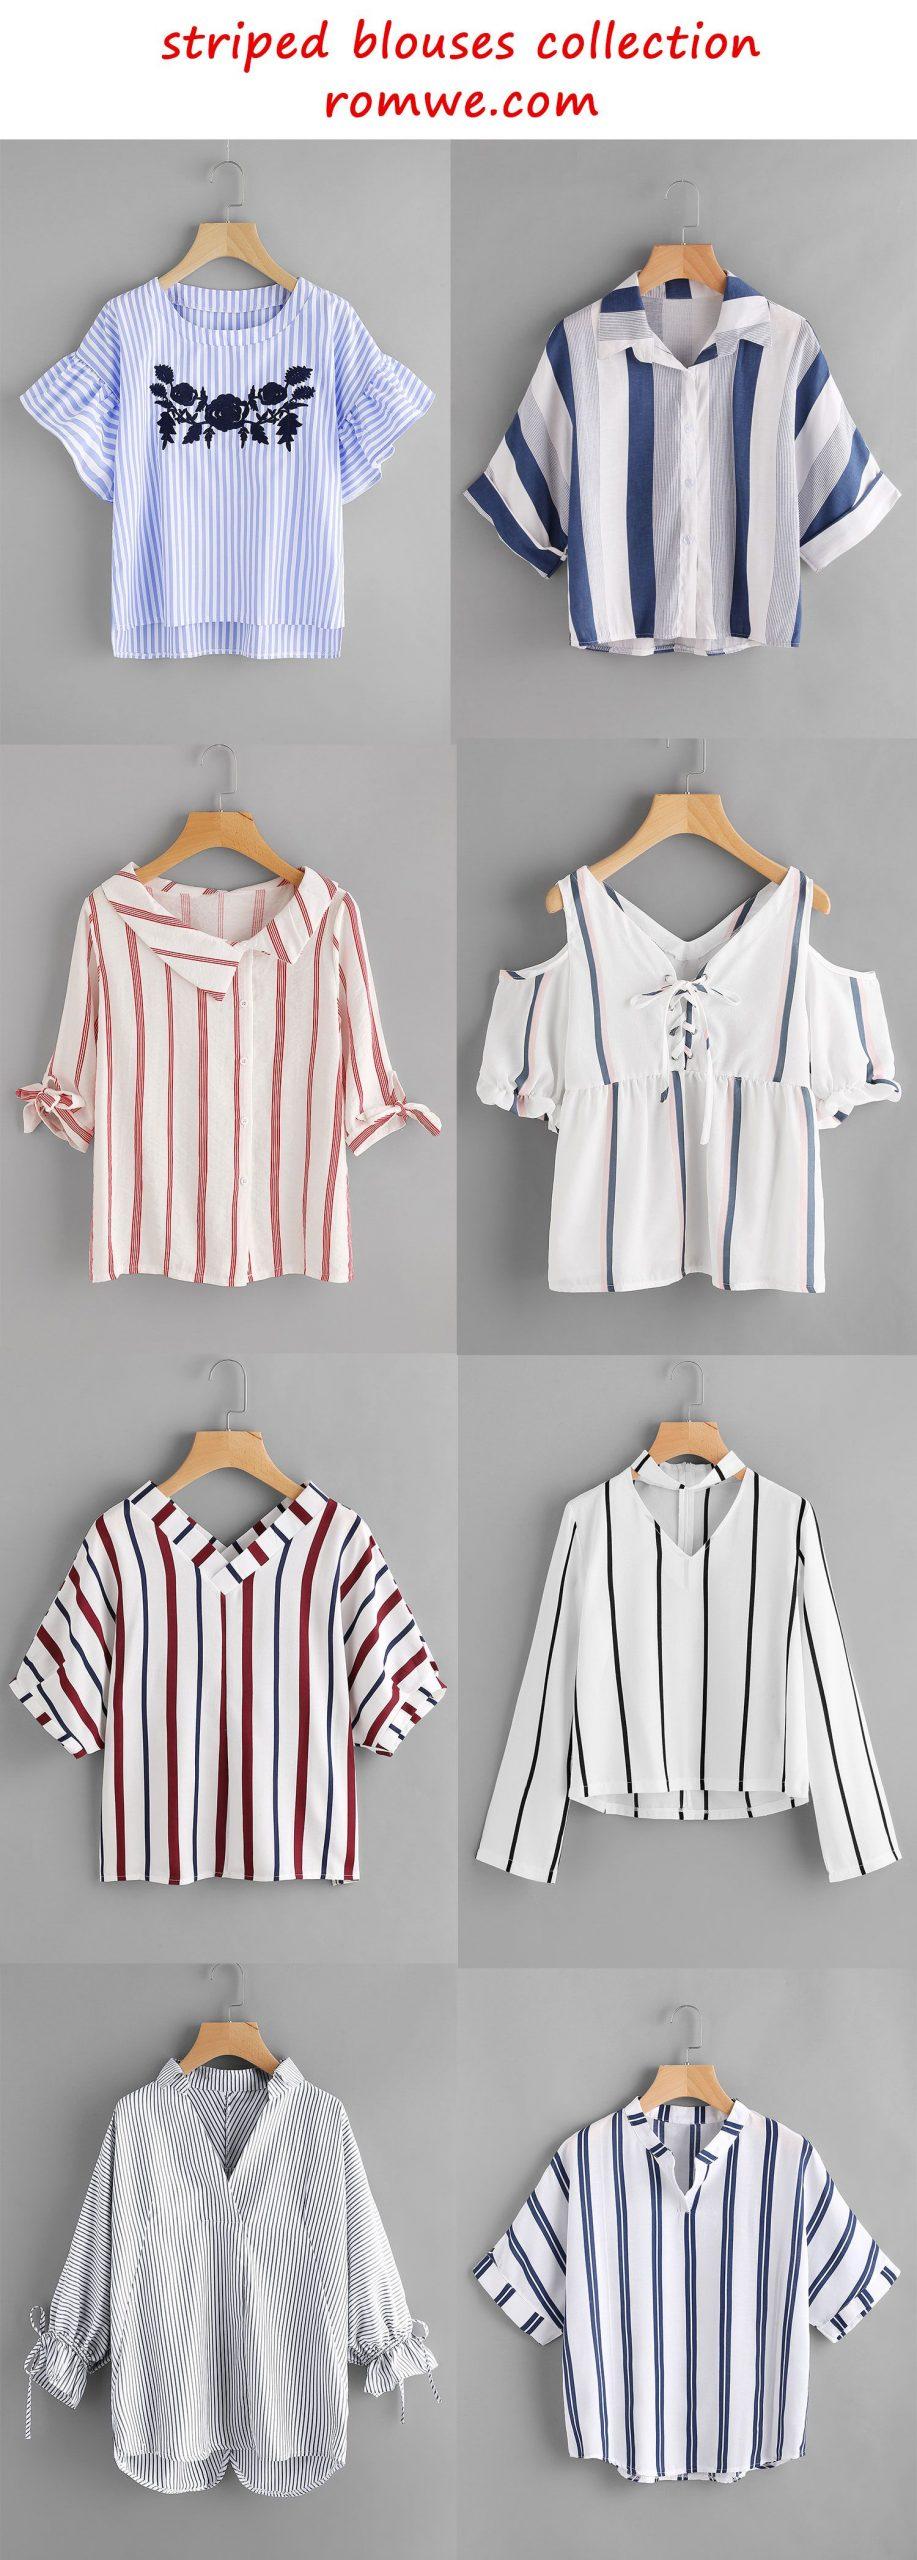 striped blouses 2017 – romwe.com